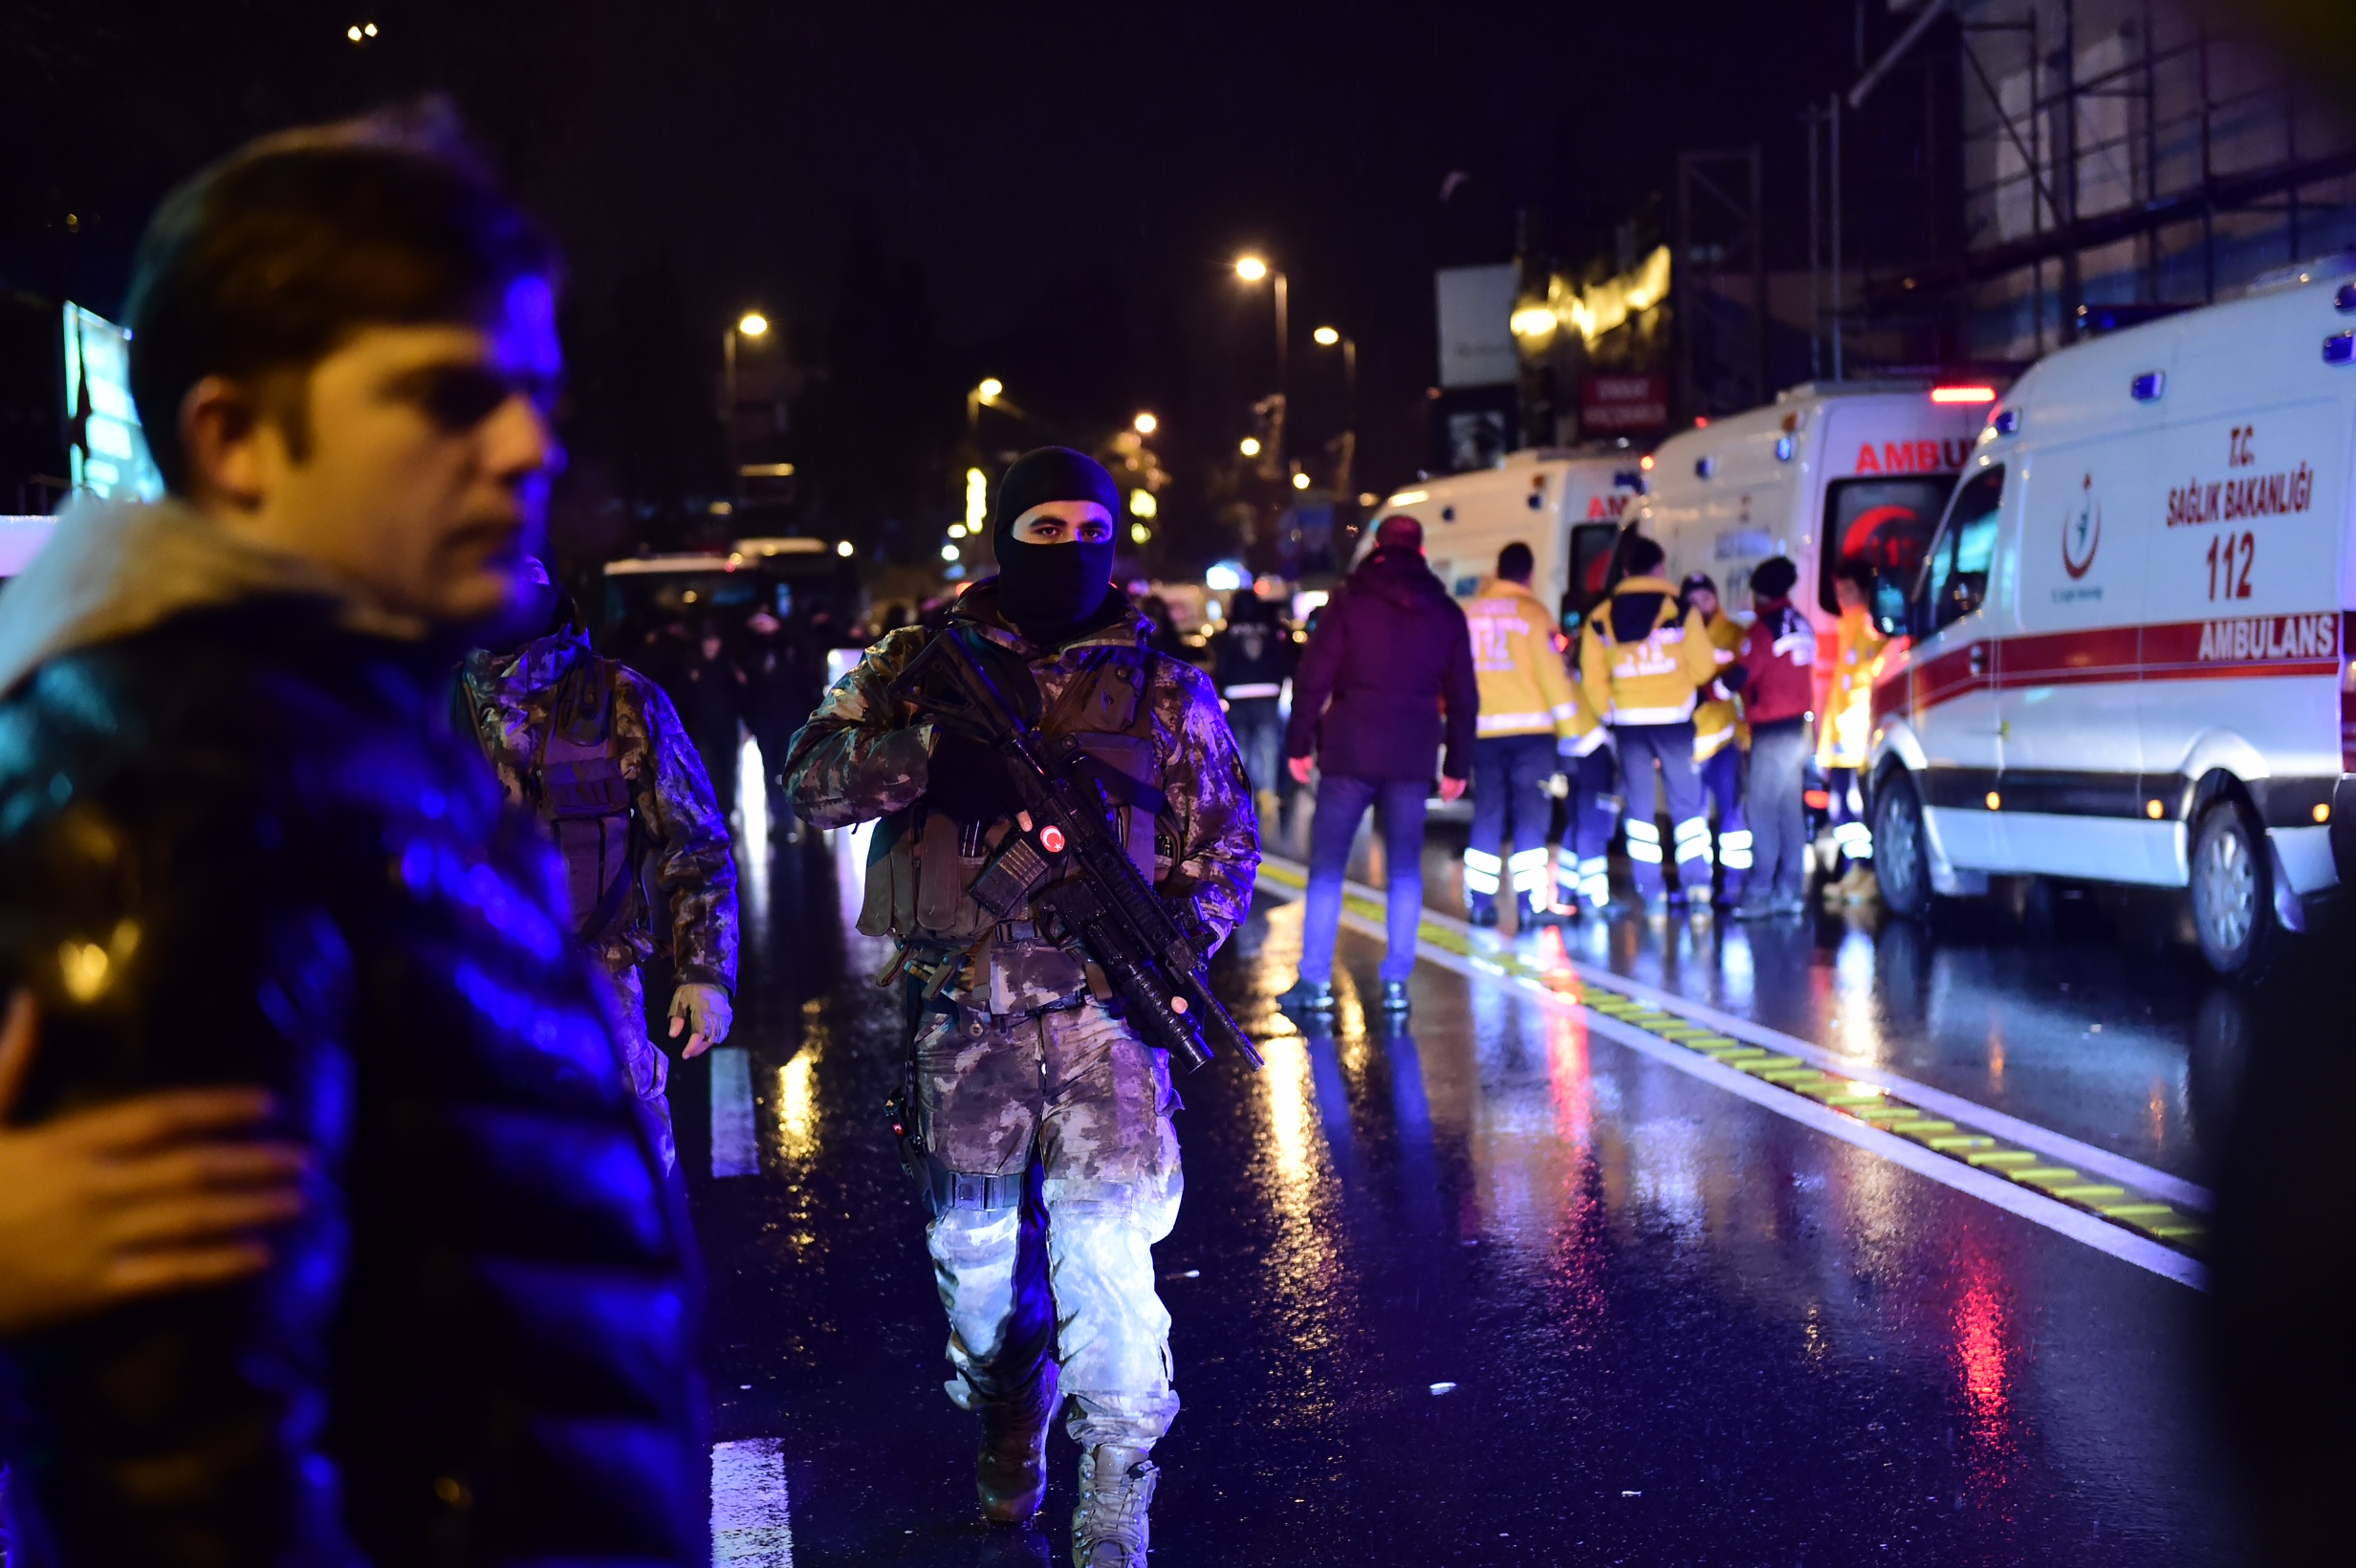 مصابون باسطنبول